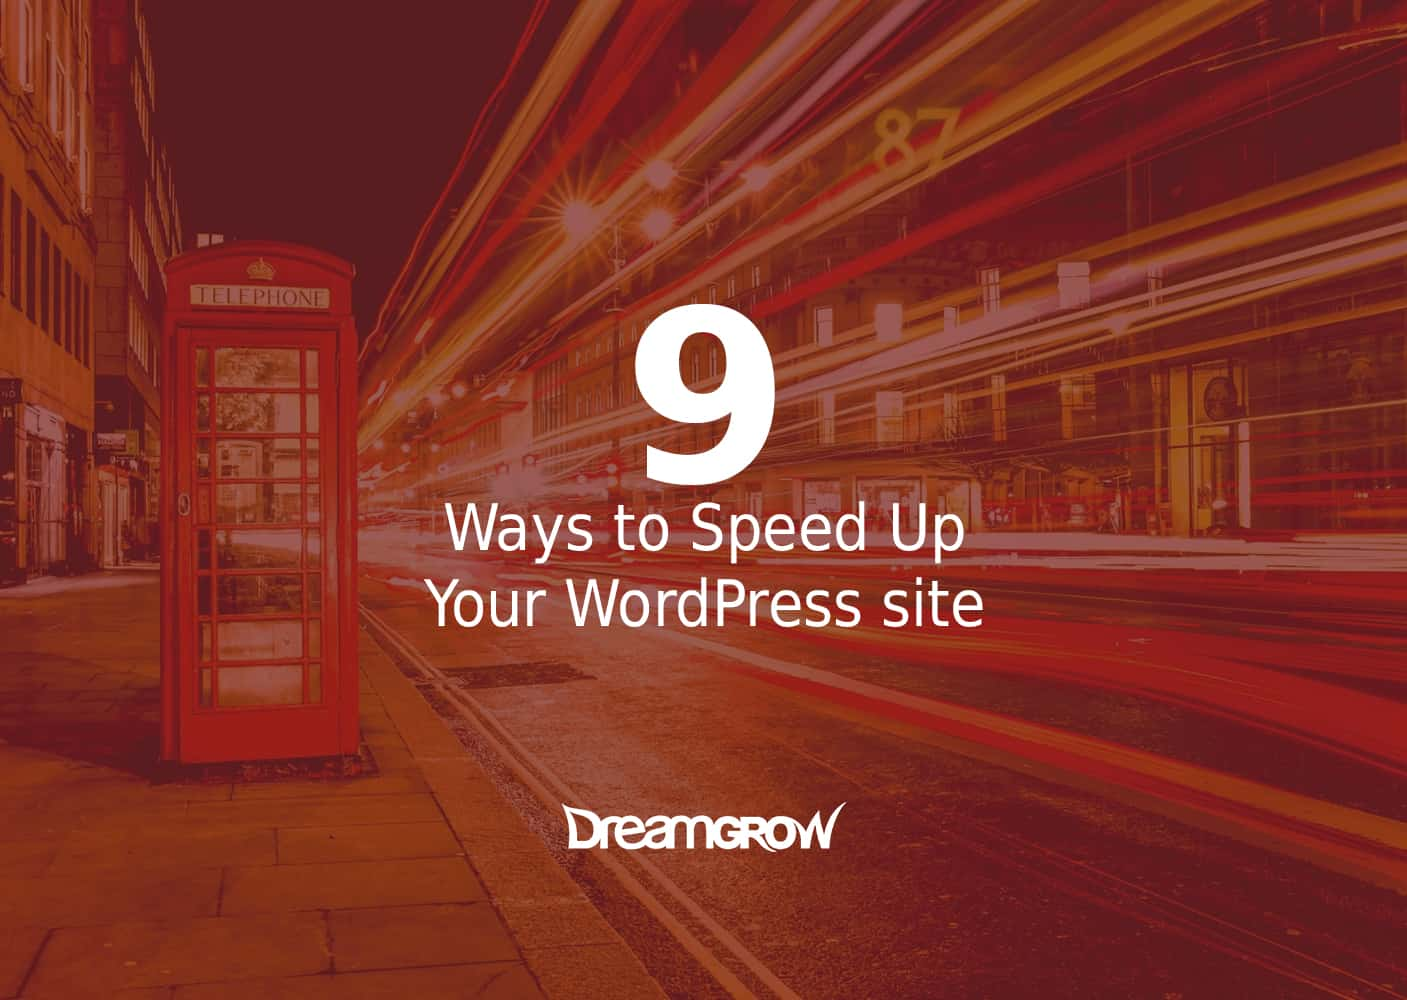 wordpress-site-speed-cover